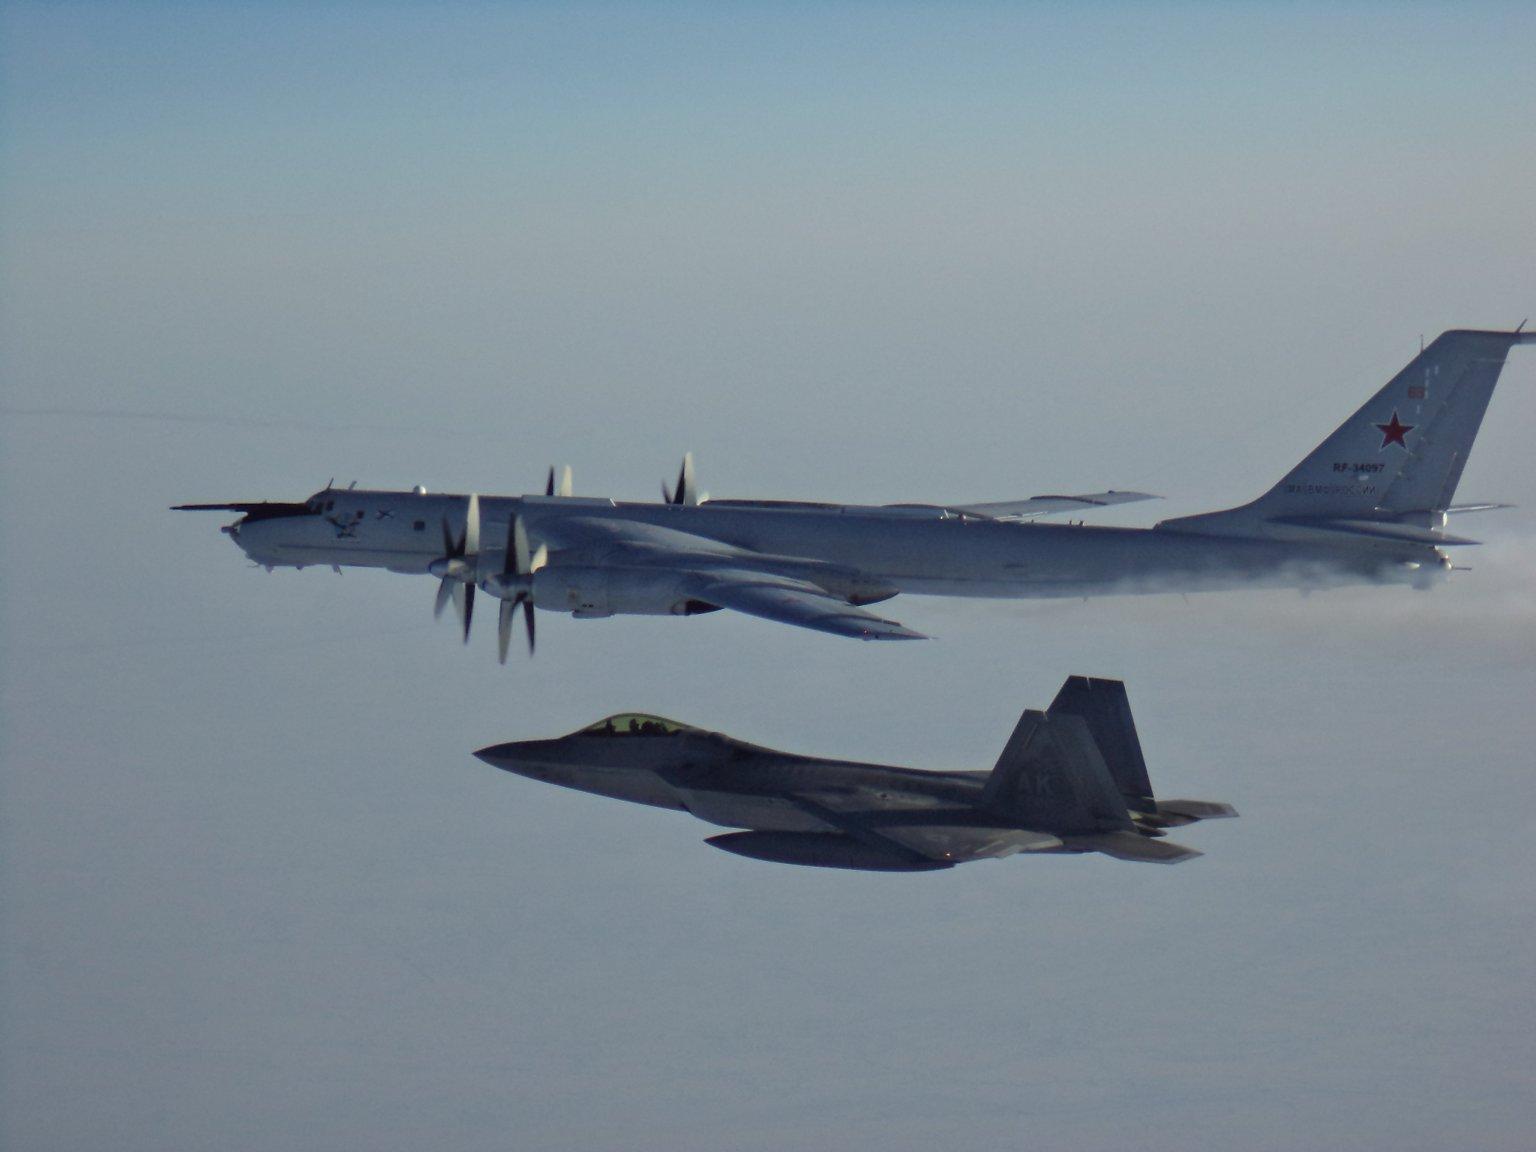 US and Canadian jets intercept Russian reconnaissance aircraft off Alaska